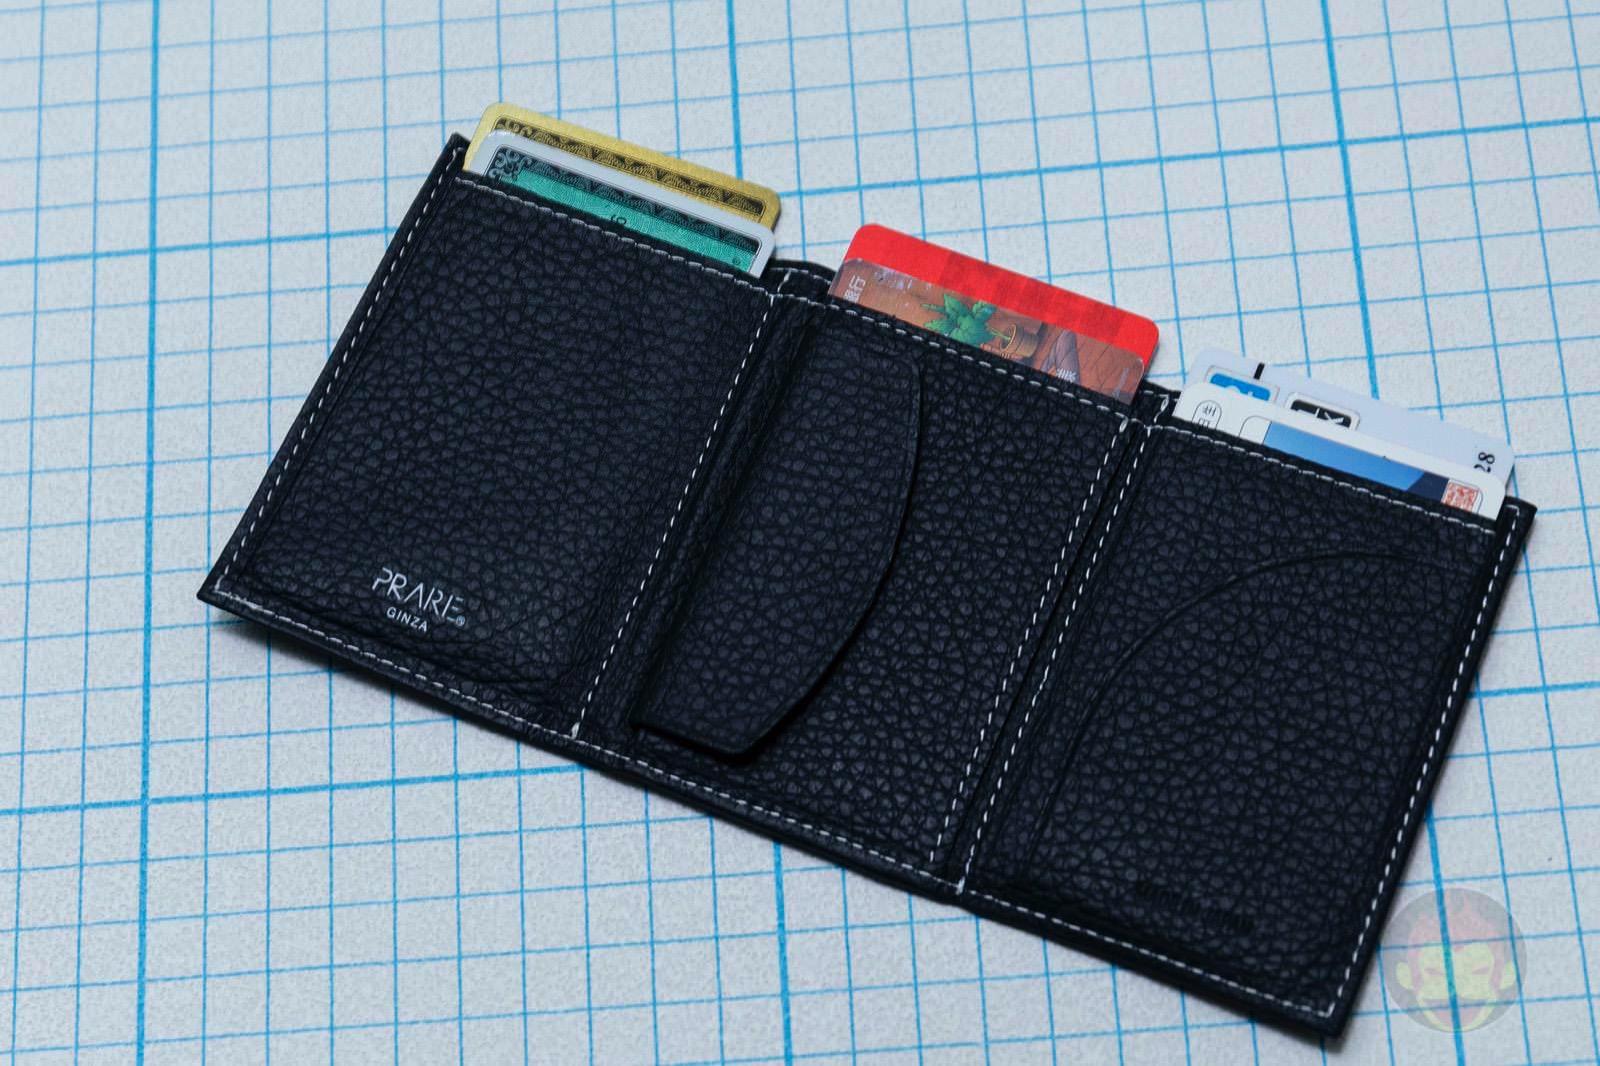 PRESSo pique minimal wallet for cashless 12